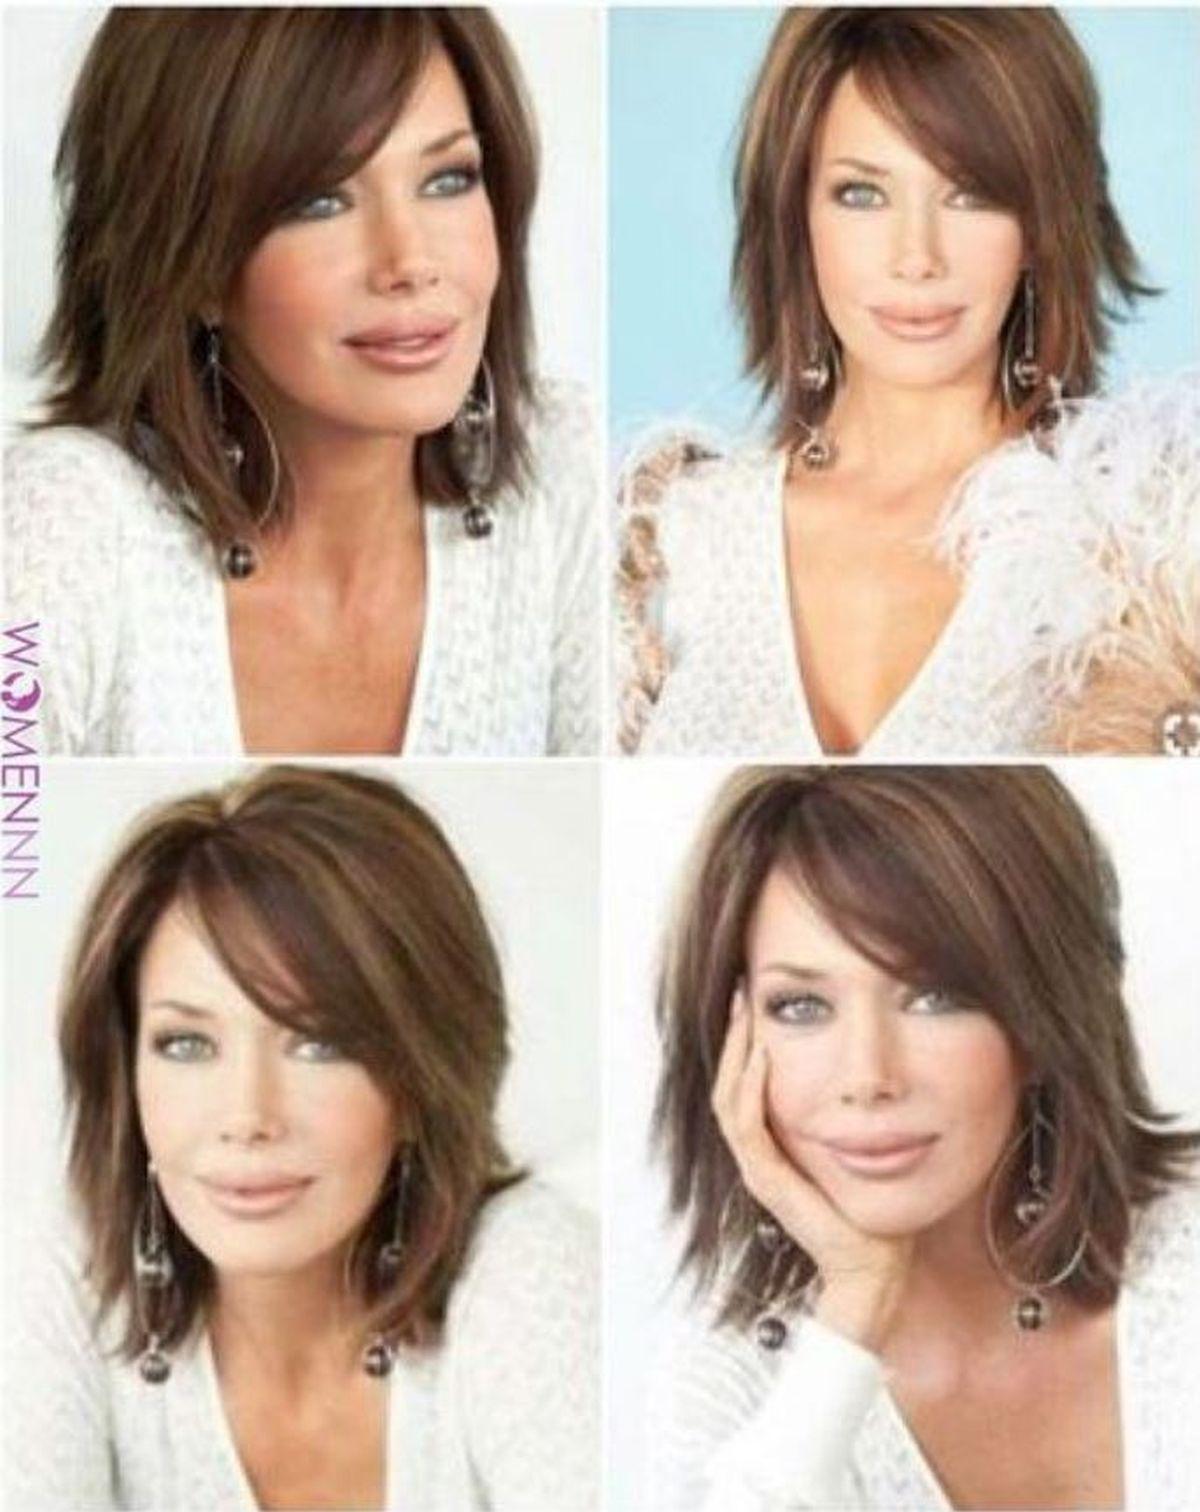 Felhosszu Noi Frizurak 50 Felett Frizurakepek Thick Hair Styles Medium Hair Styles Short Hair Styles